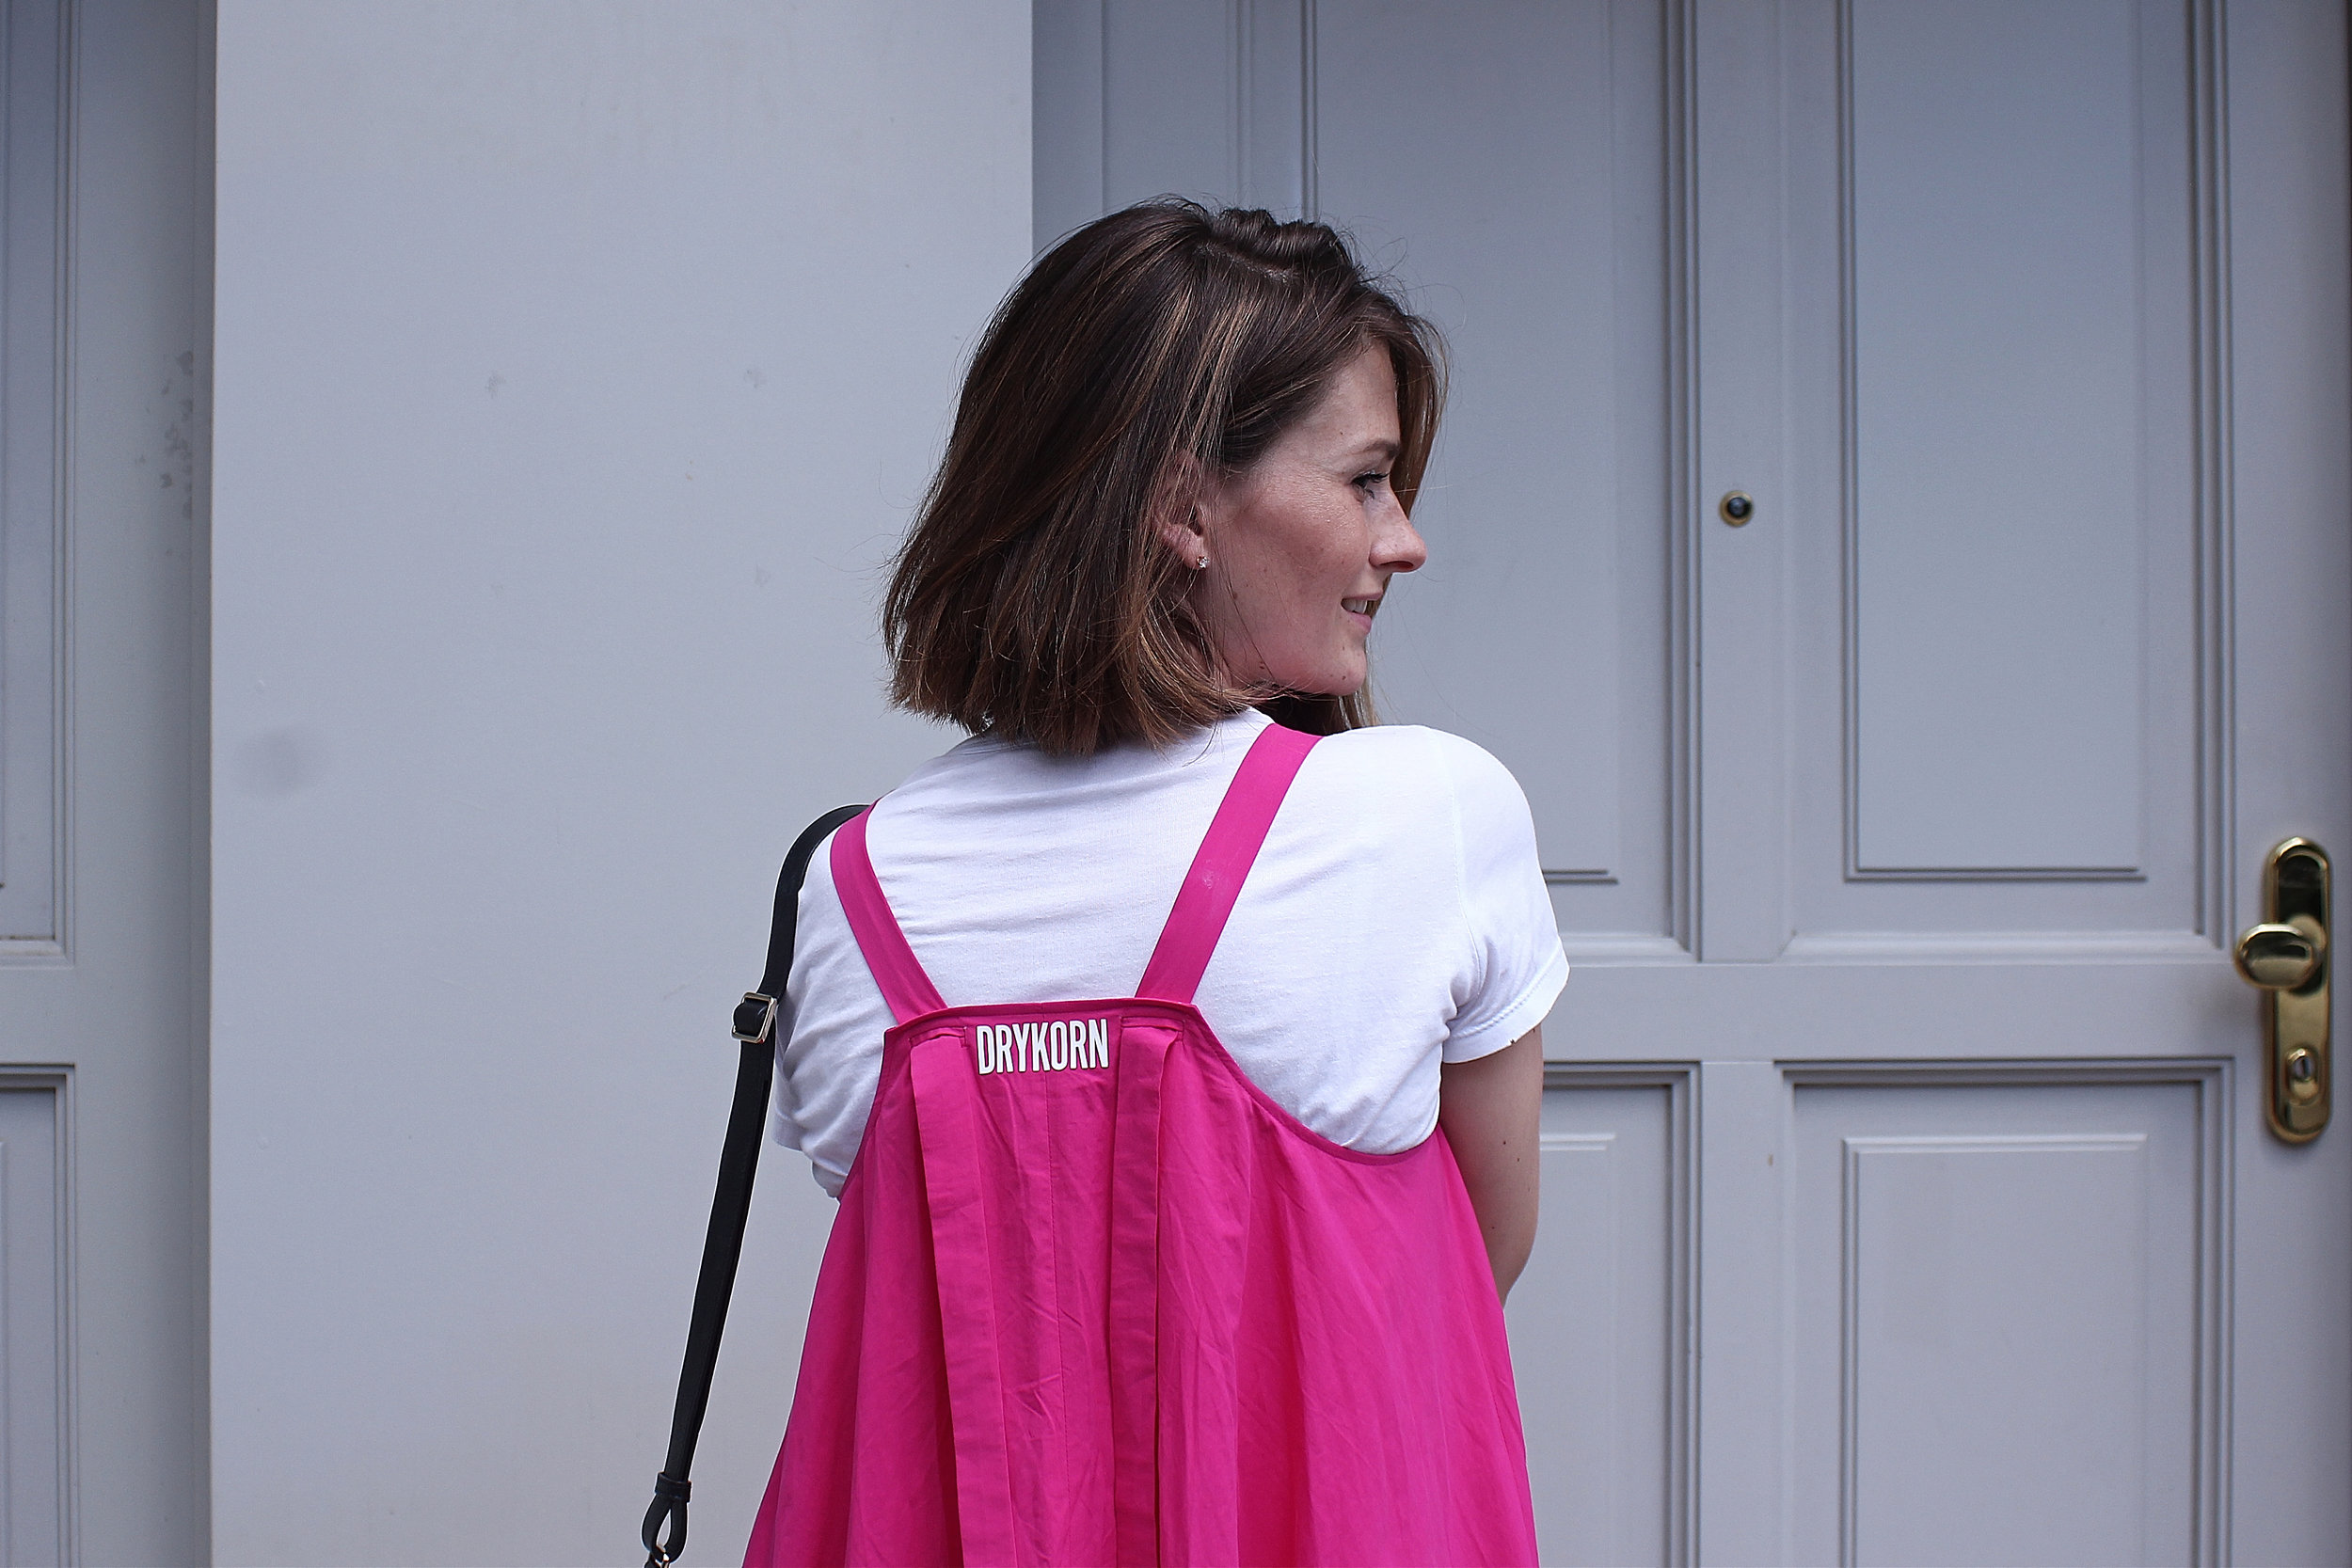 annaporter-pink-dress-drykorn-portrait-1